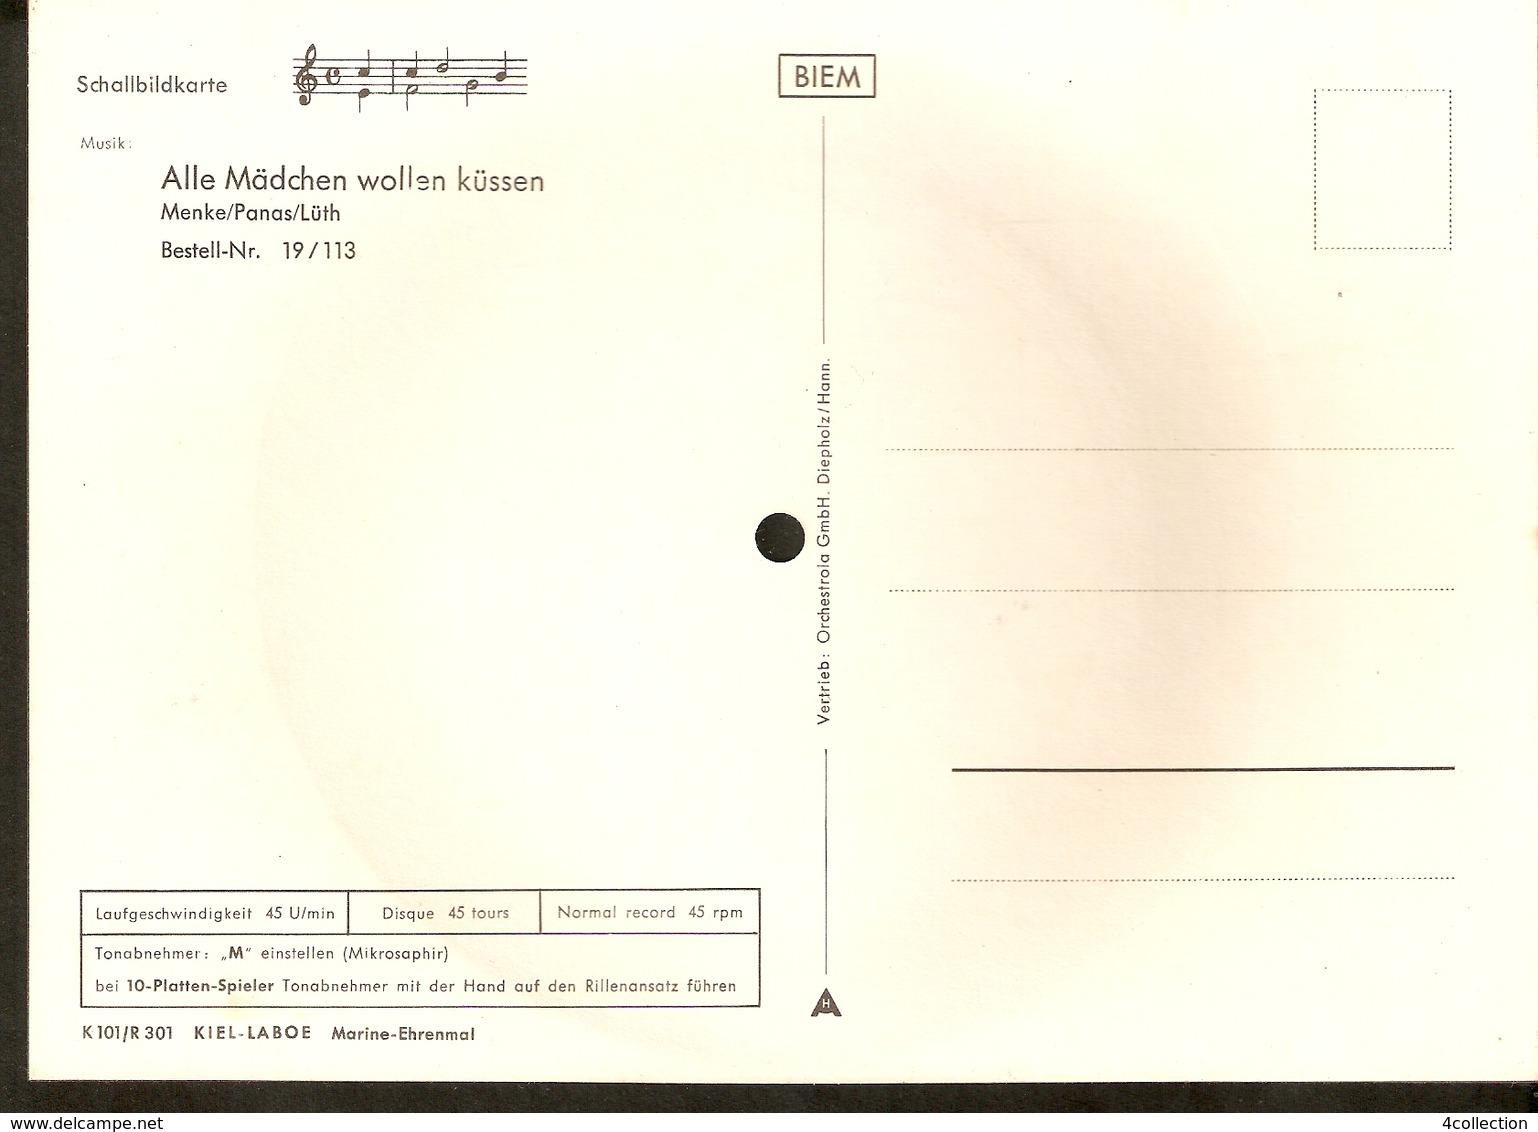 Old Musical 45rpm Record Postcard Schallbildkarte KIEL Laboe Marine Ehrenmal All Madchen Wollen Kussen Menke Panas Luth - Unclassified